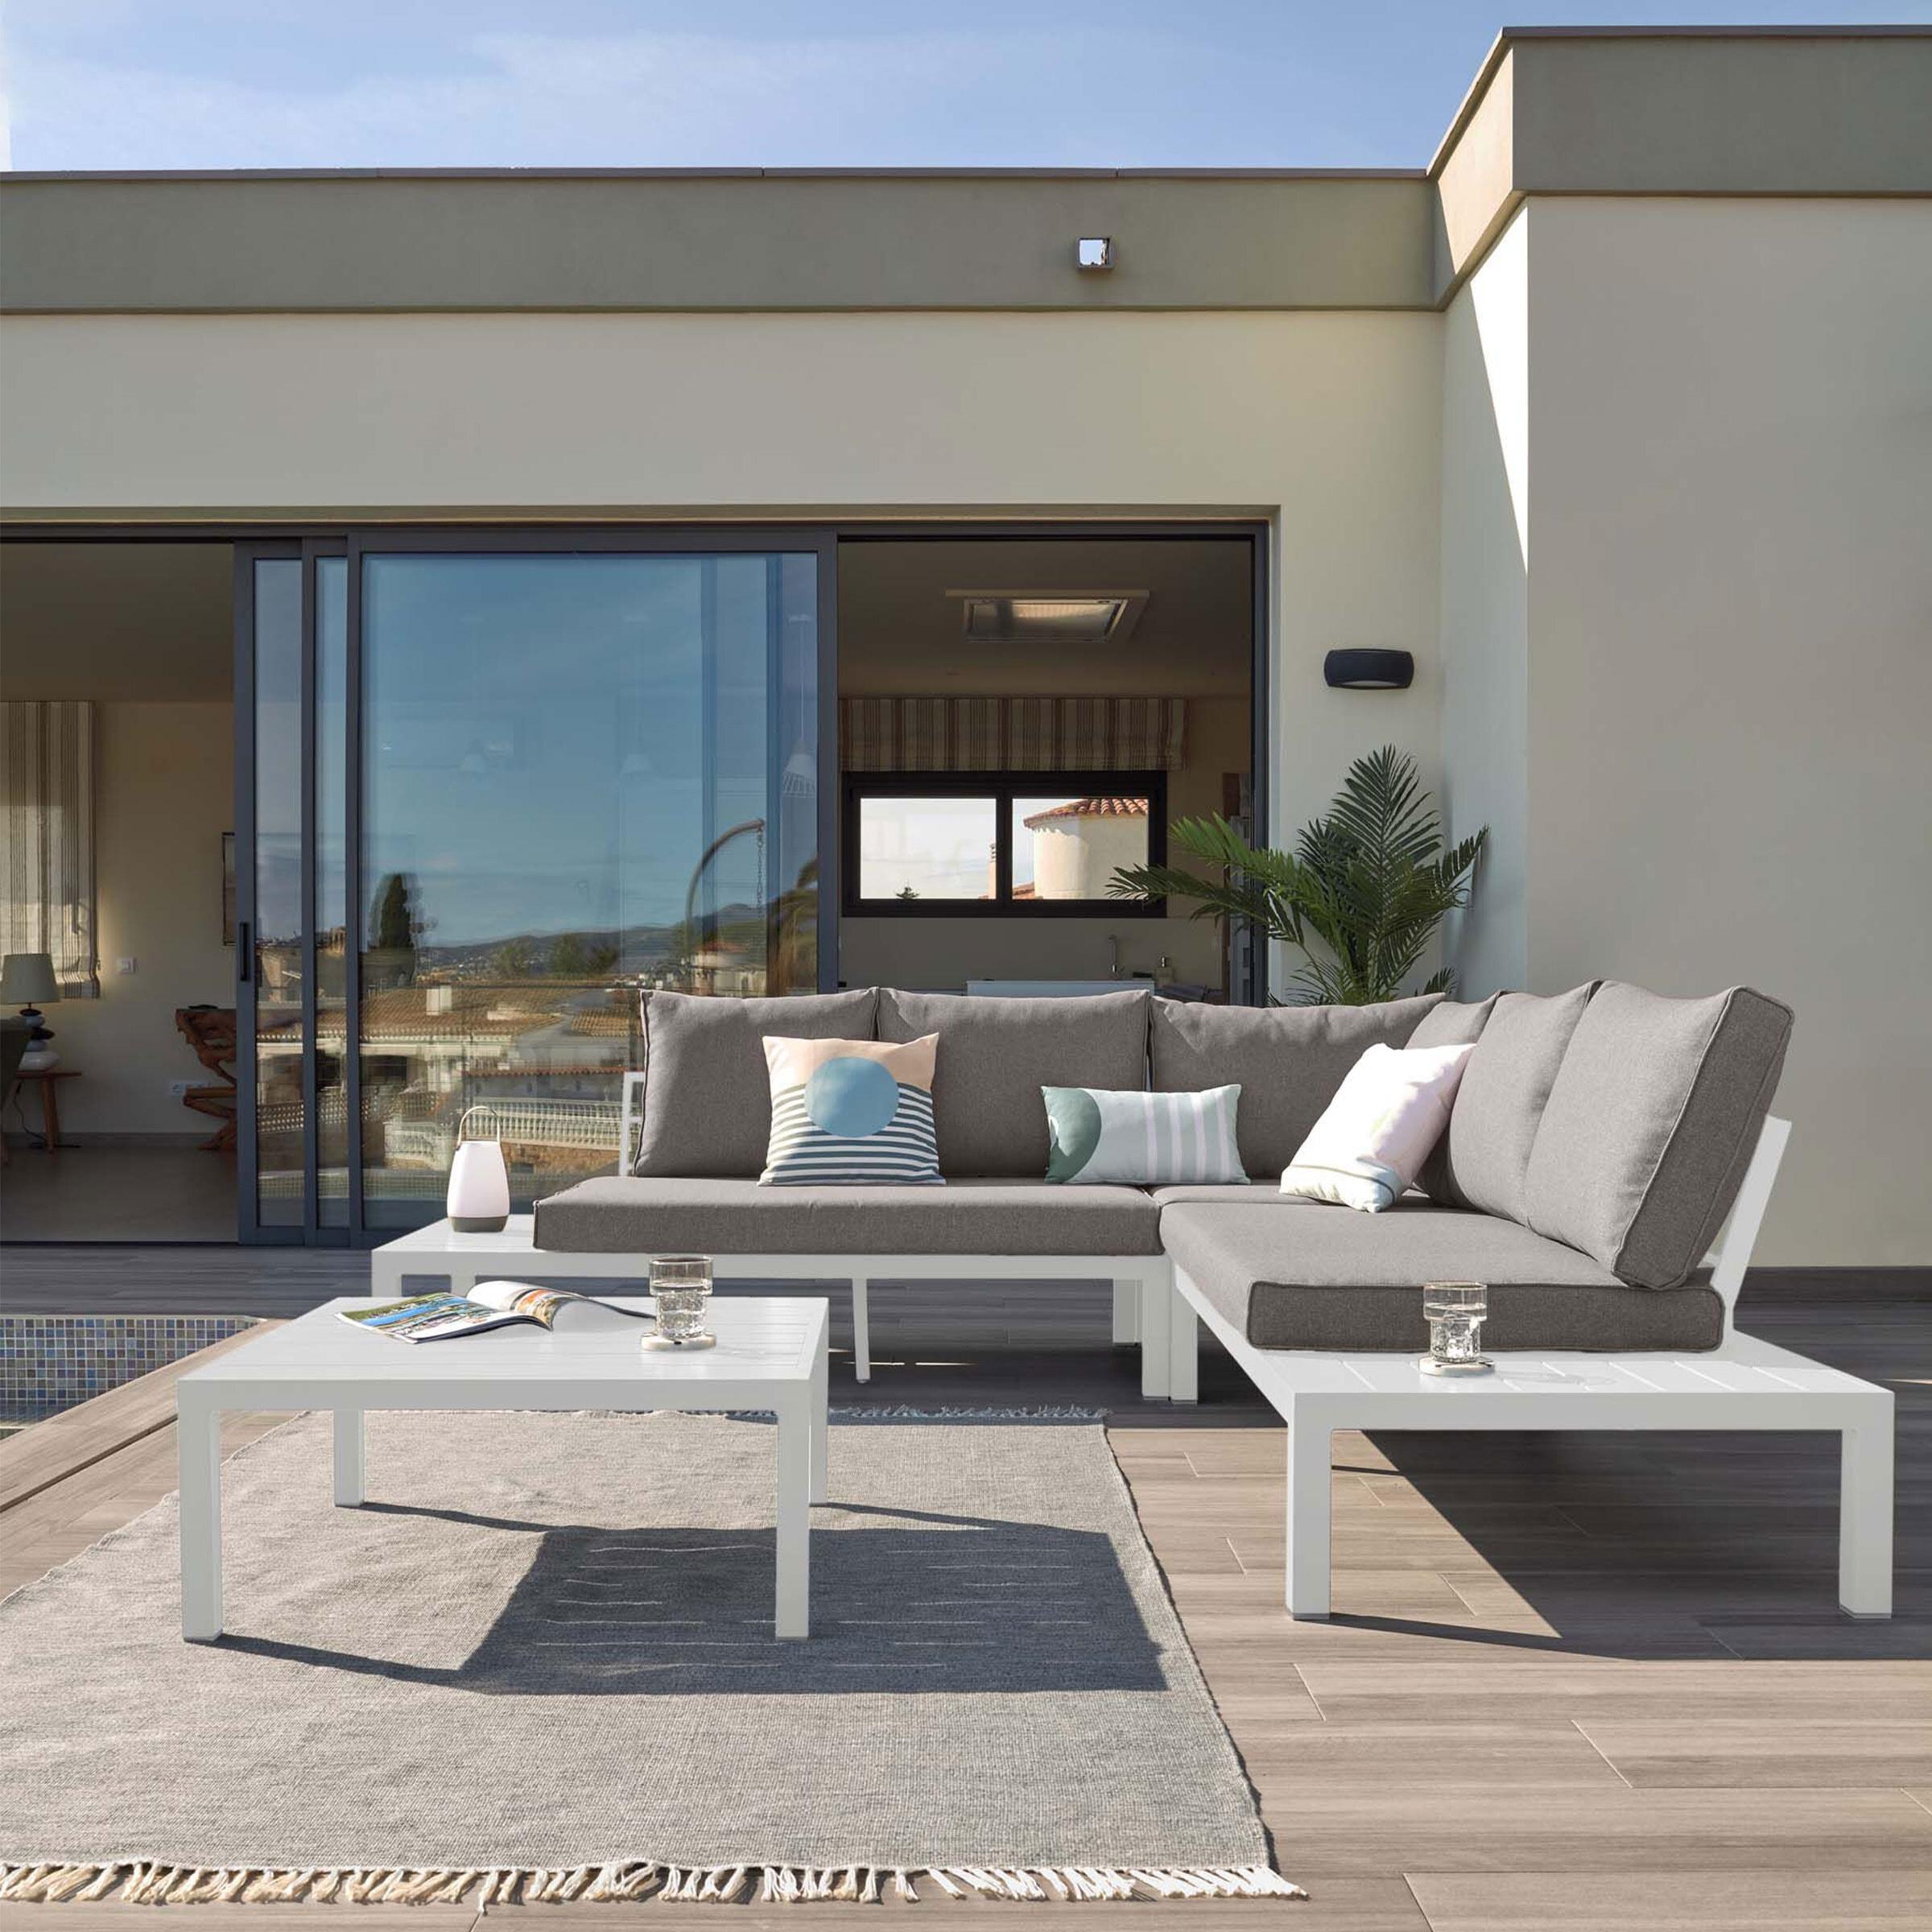 Kave Home Loungeset 'Duka' kleur Wit | Kave Home